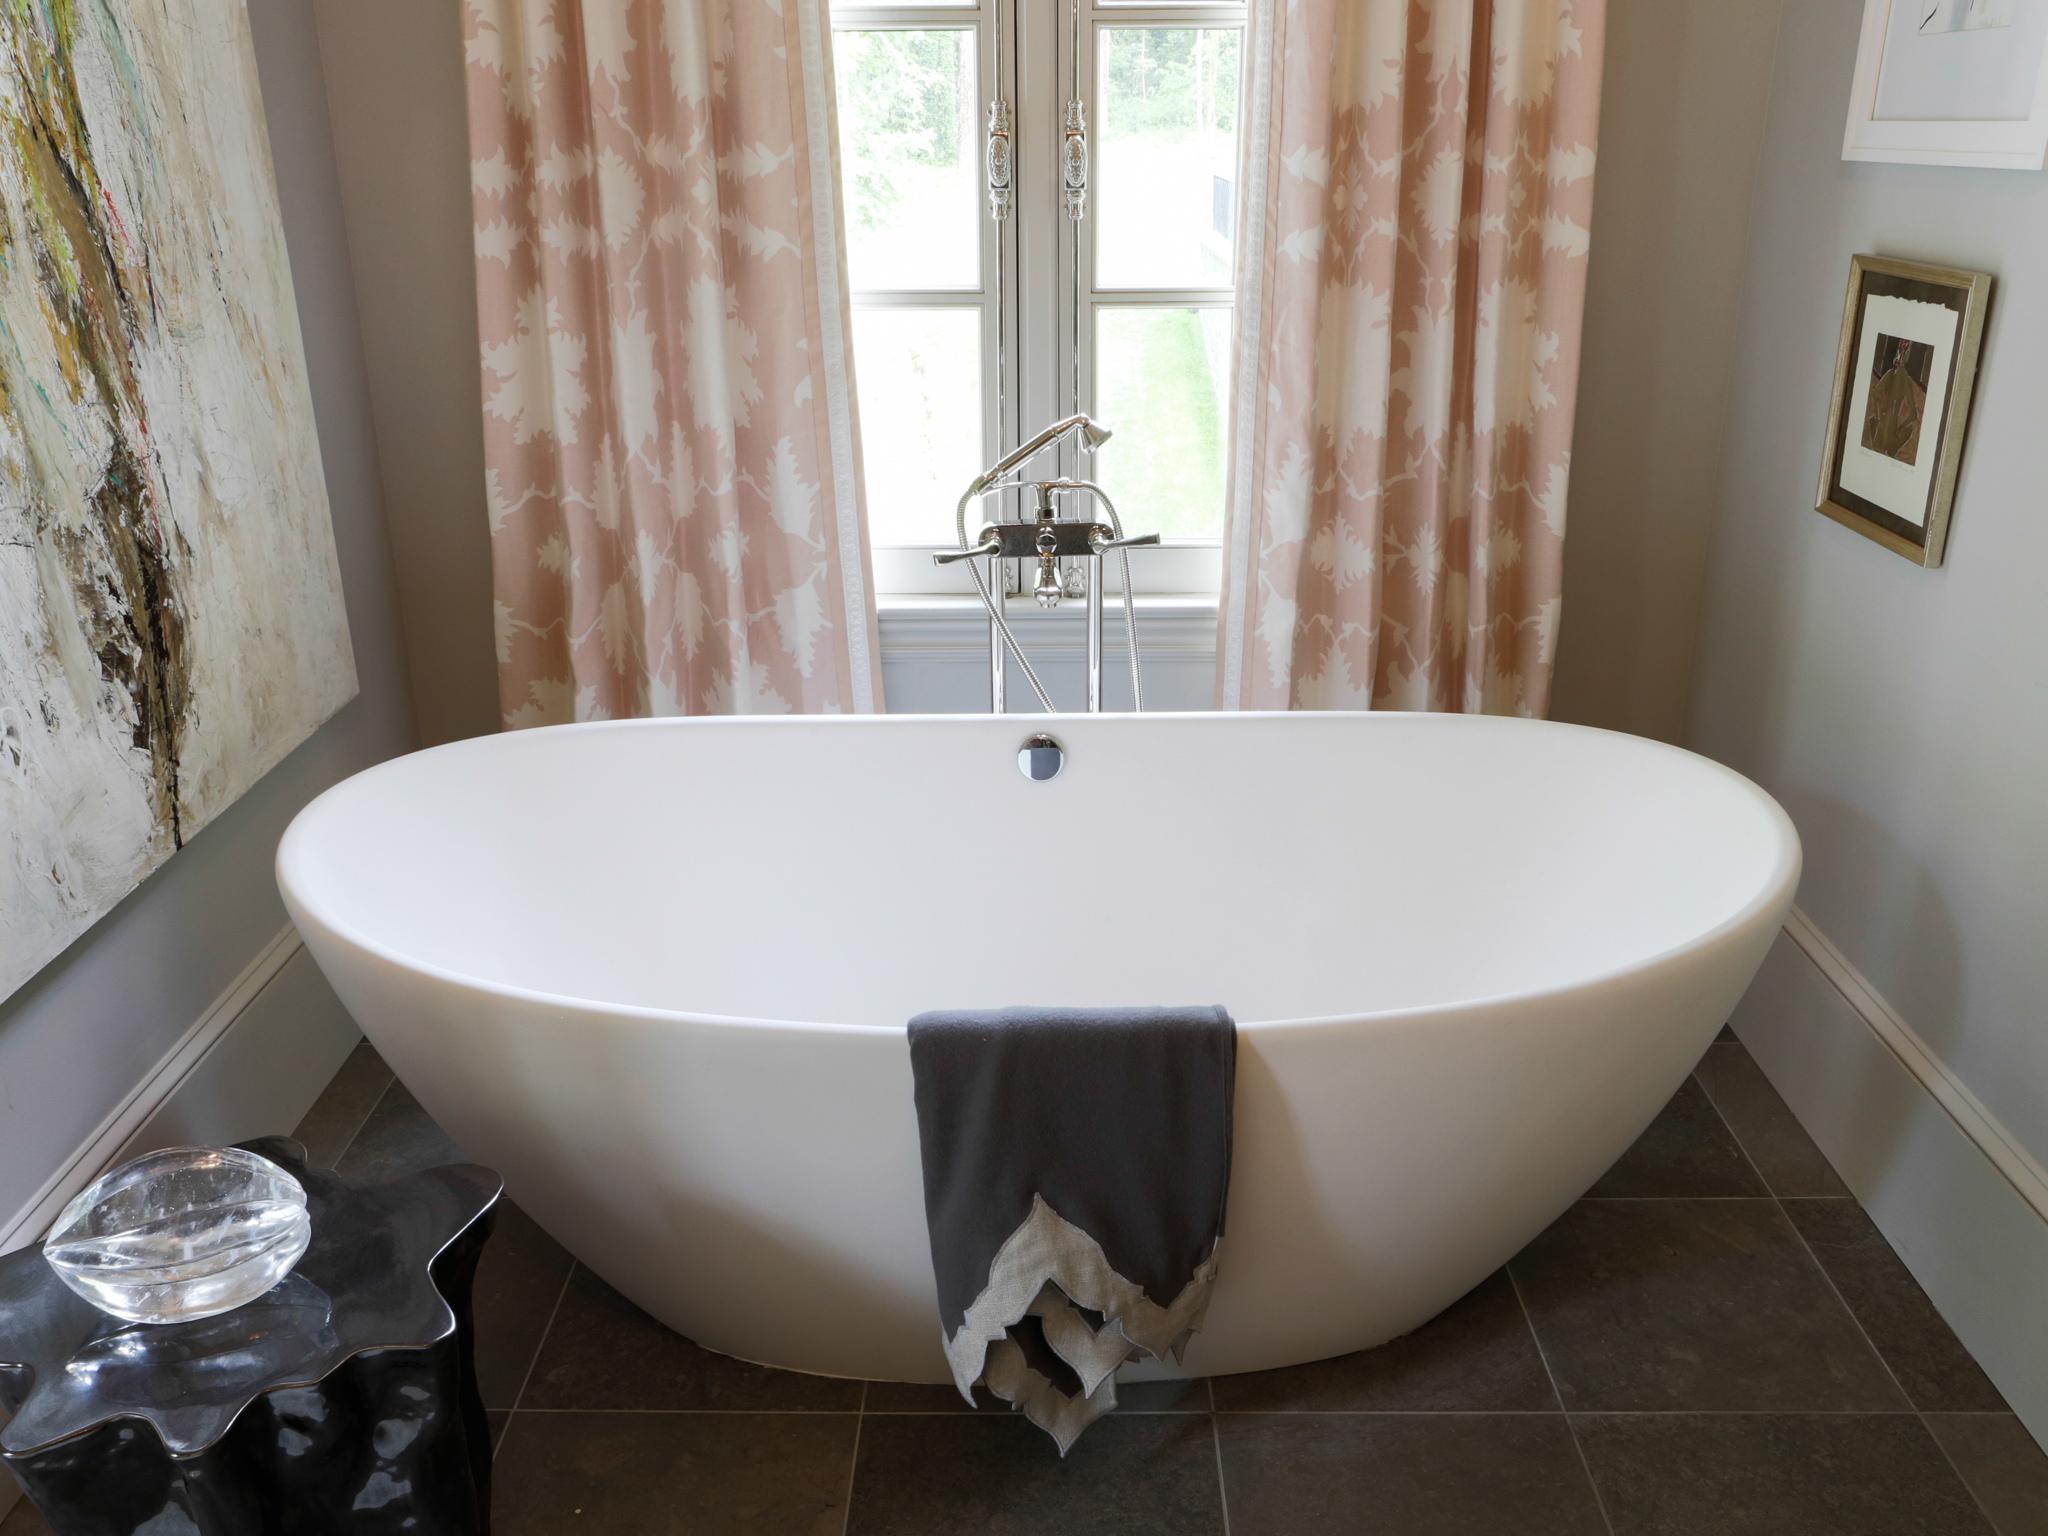 Lovely Kitchen Bath Showrooms Nyc Big Bathroom Wall Fixtures Regular Small Bathroom Designs Shower Stall Best Ceramic Tile For Bathroom Floors Young Bathroom Door Design Pictures BlackBathrooms Designs Pinterest Small Deep Corner Bathtub   Rukinet